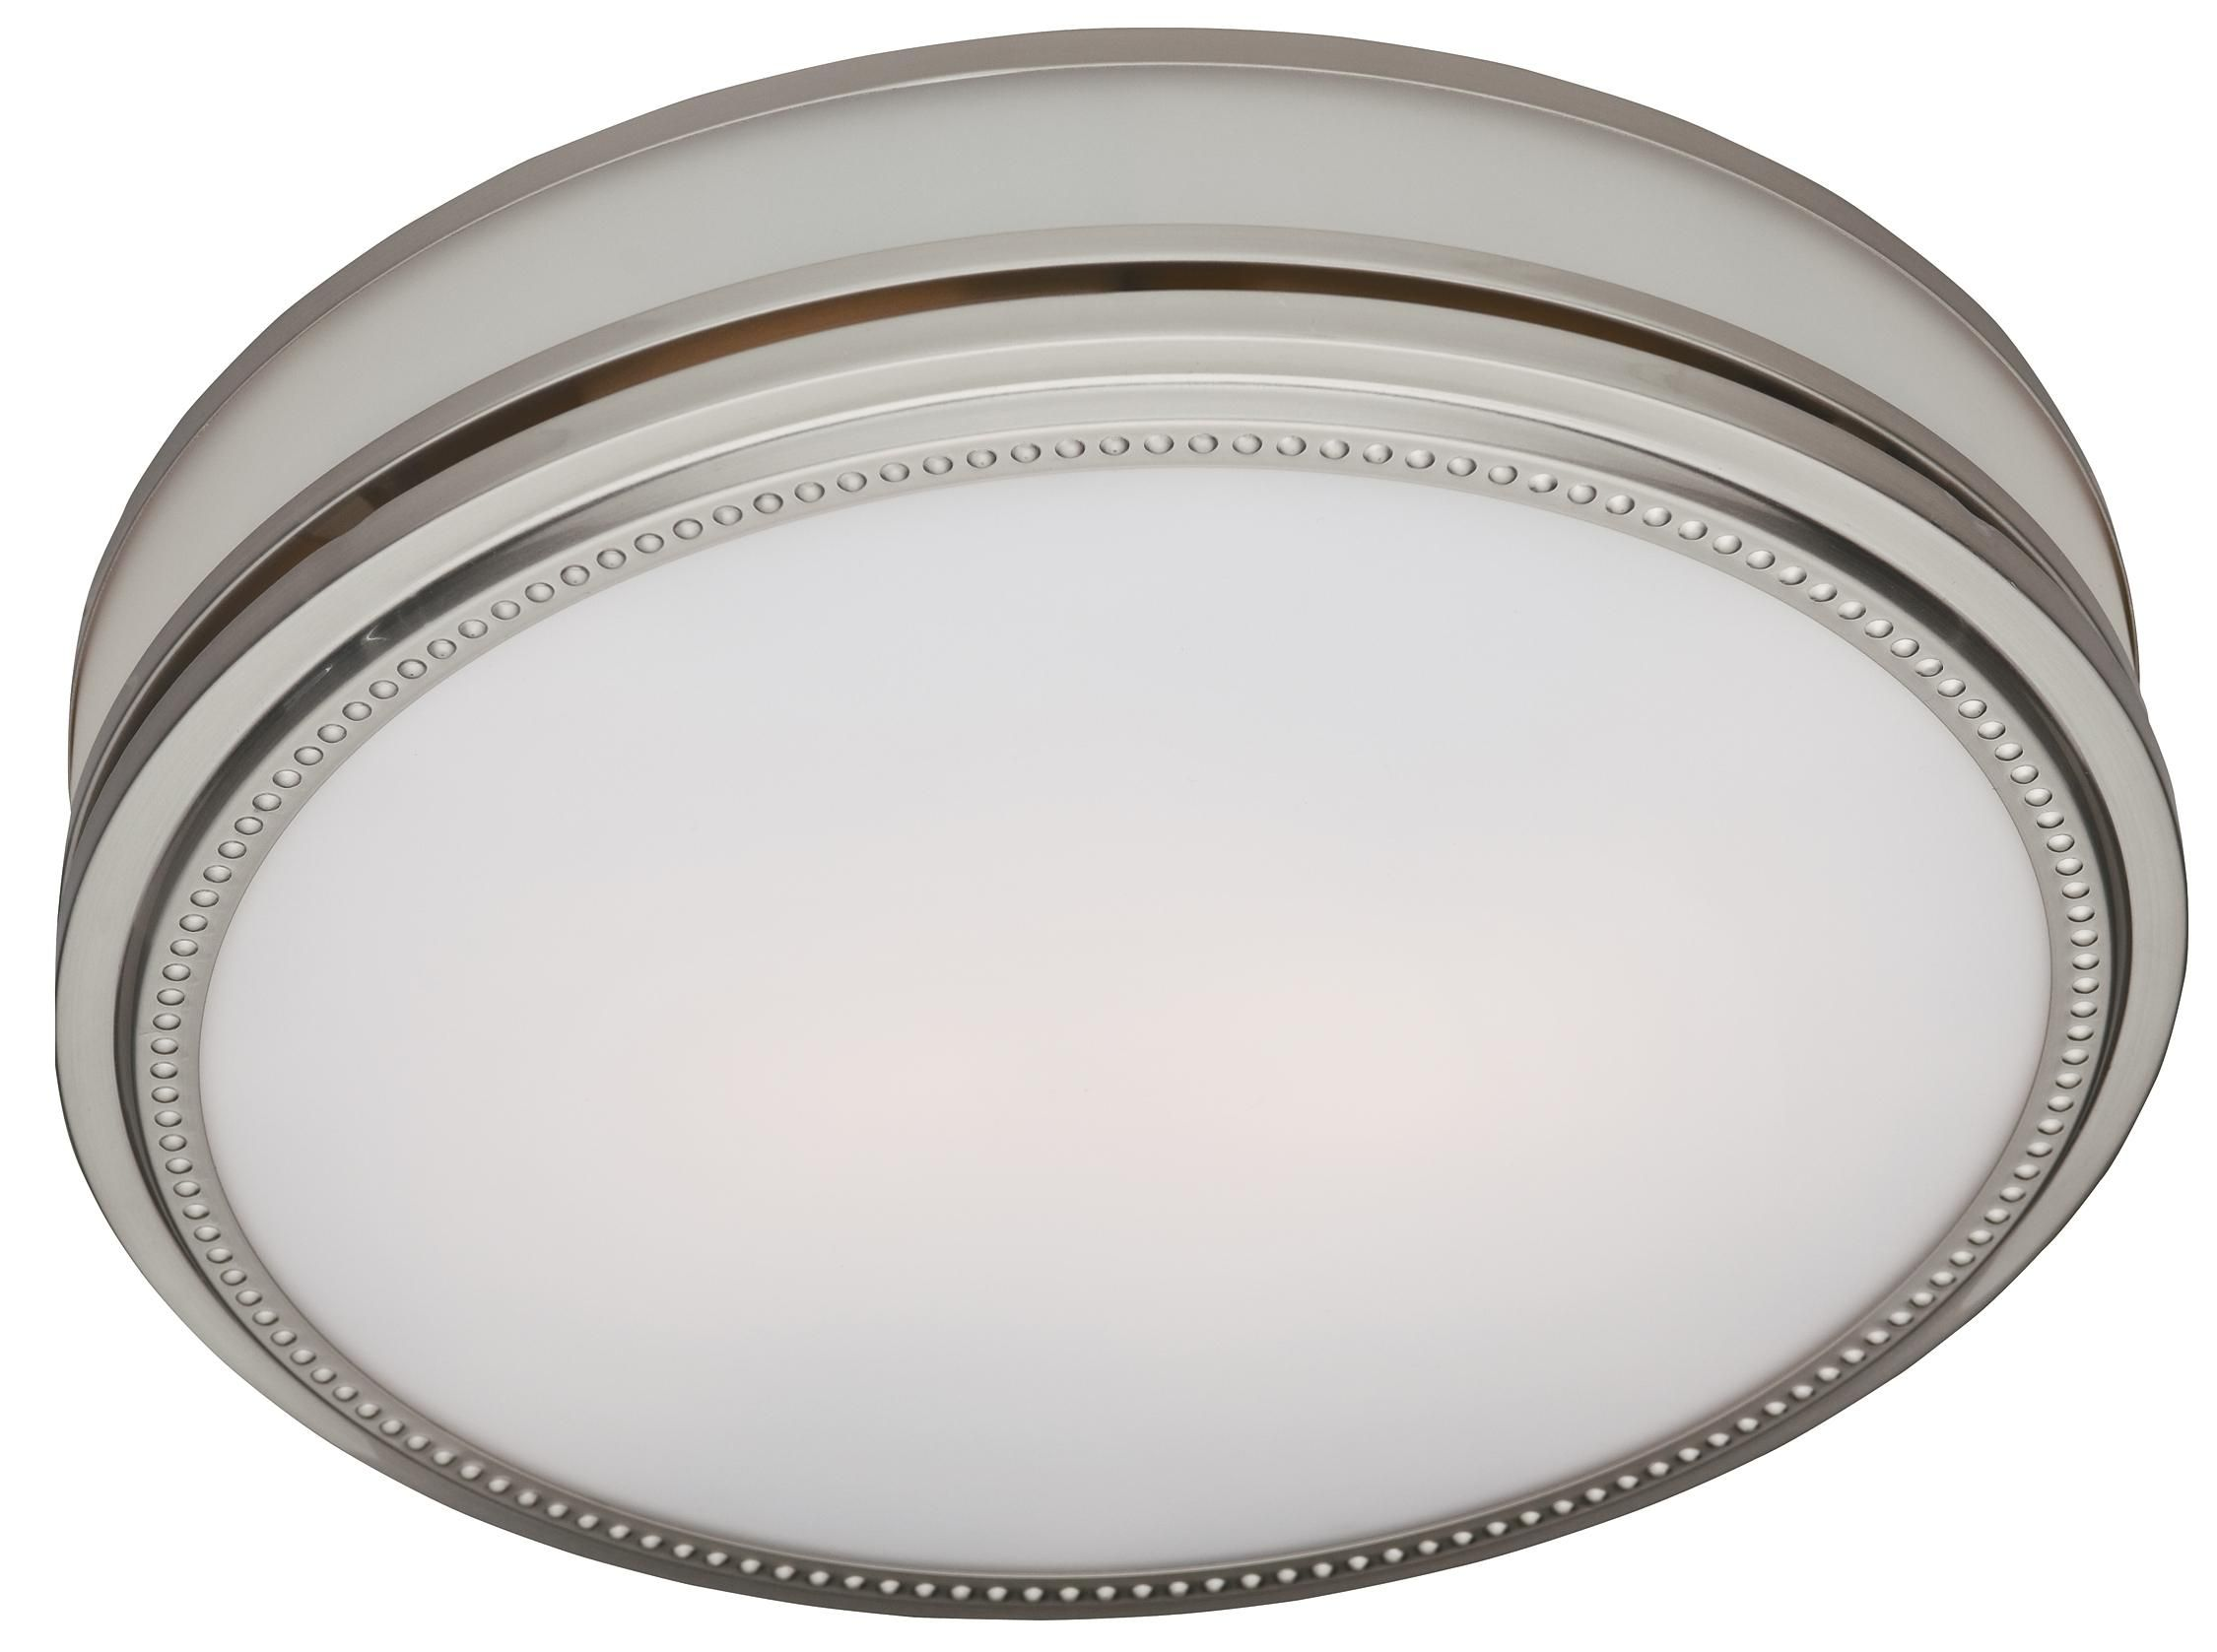 1000+ ideas about Bathroom Fan Light on Pinterest | Bathroom fans, Tub  resurfacing and Bathroom heater